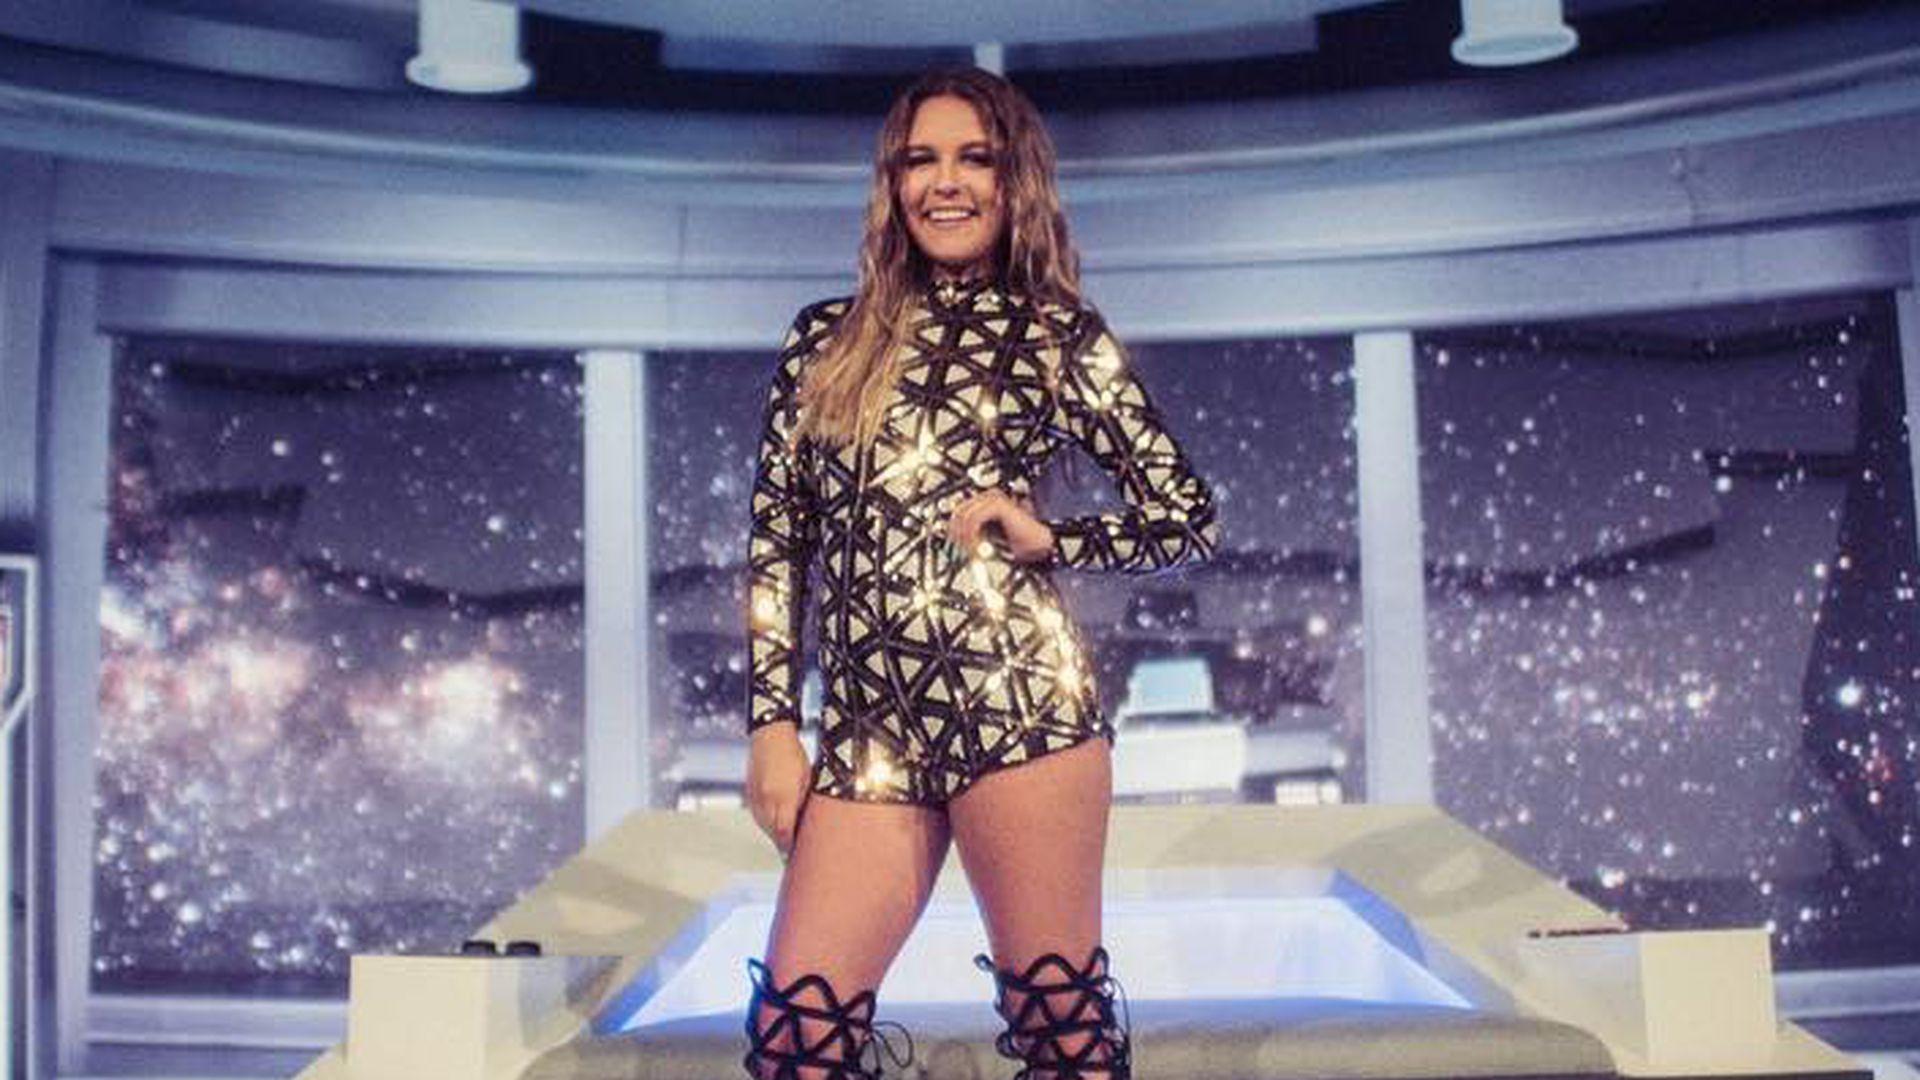 Stars - KUKKSI | Star News, Beauty und Trends